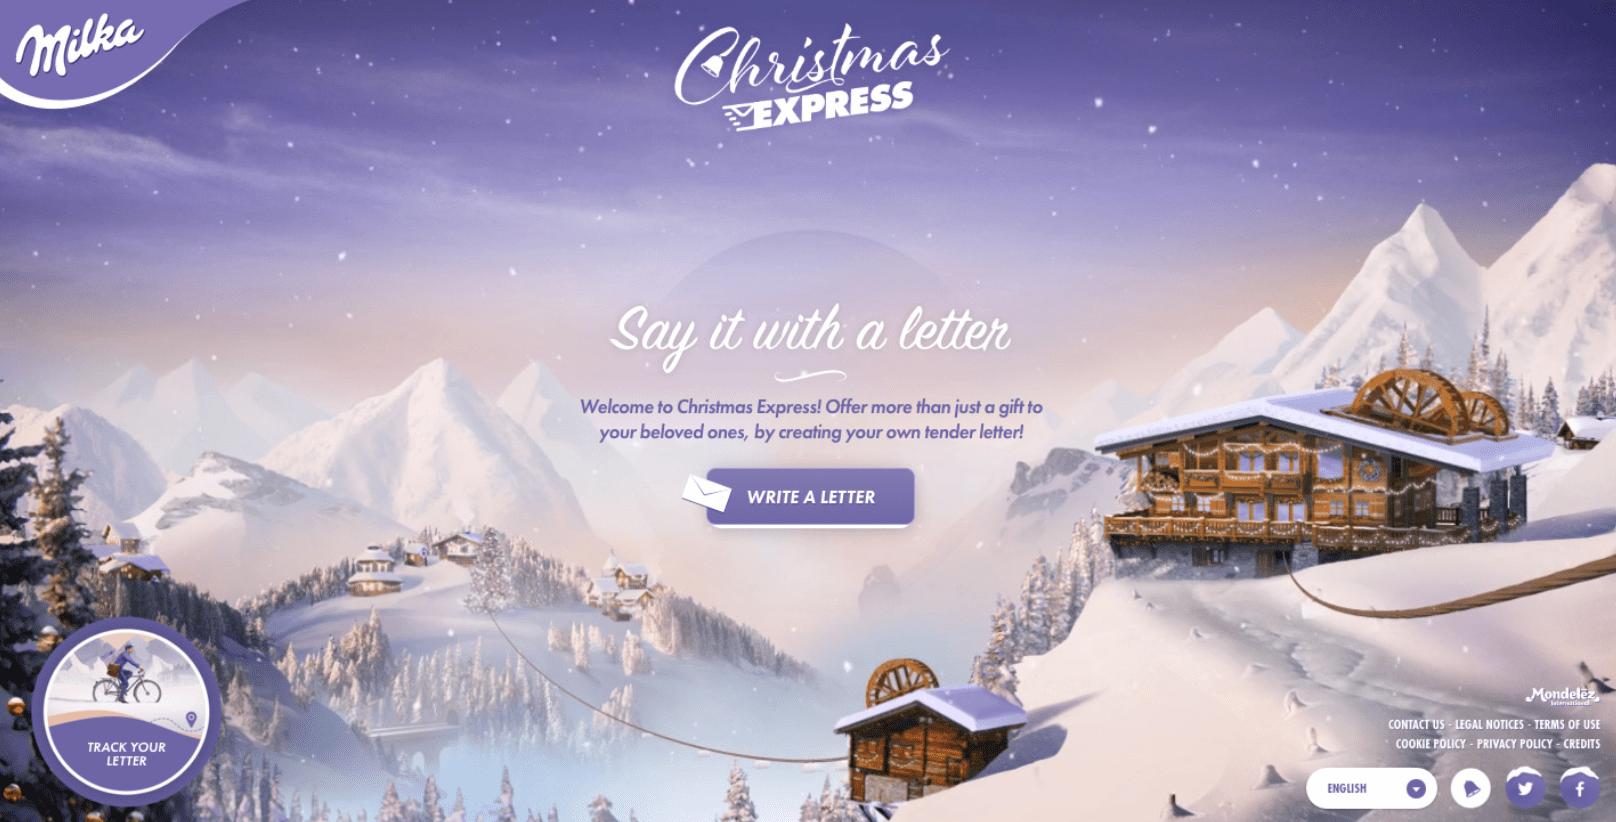 110+ Best Christmas Fonts 2020: Free & Premium - christmas font 37